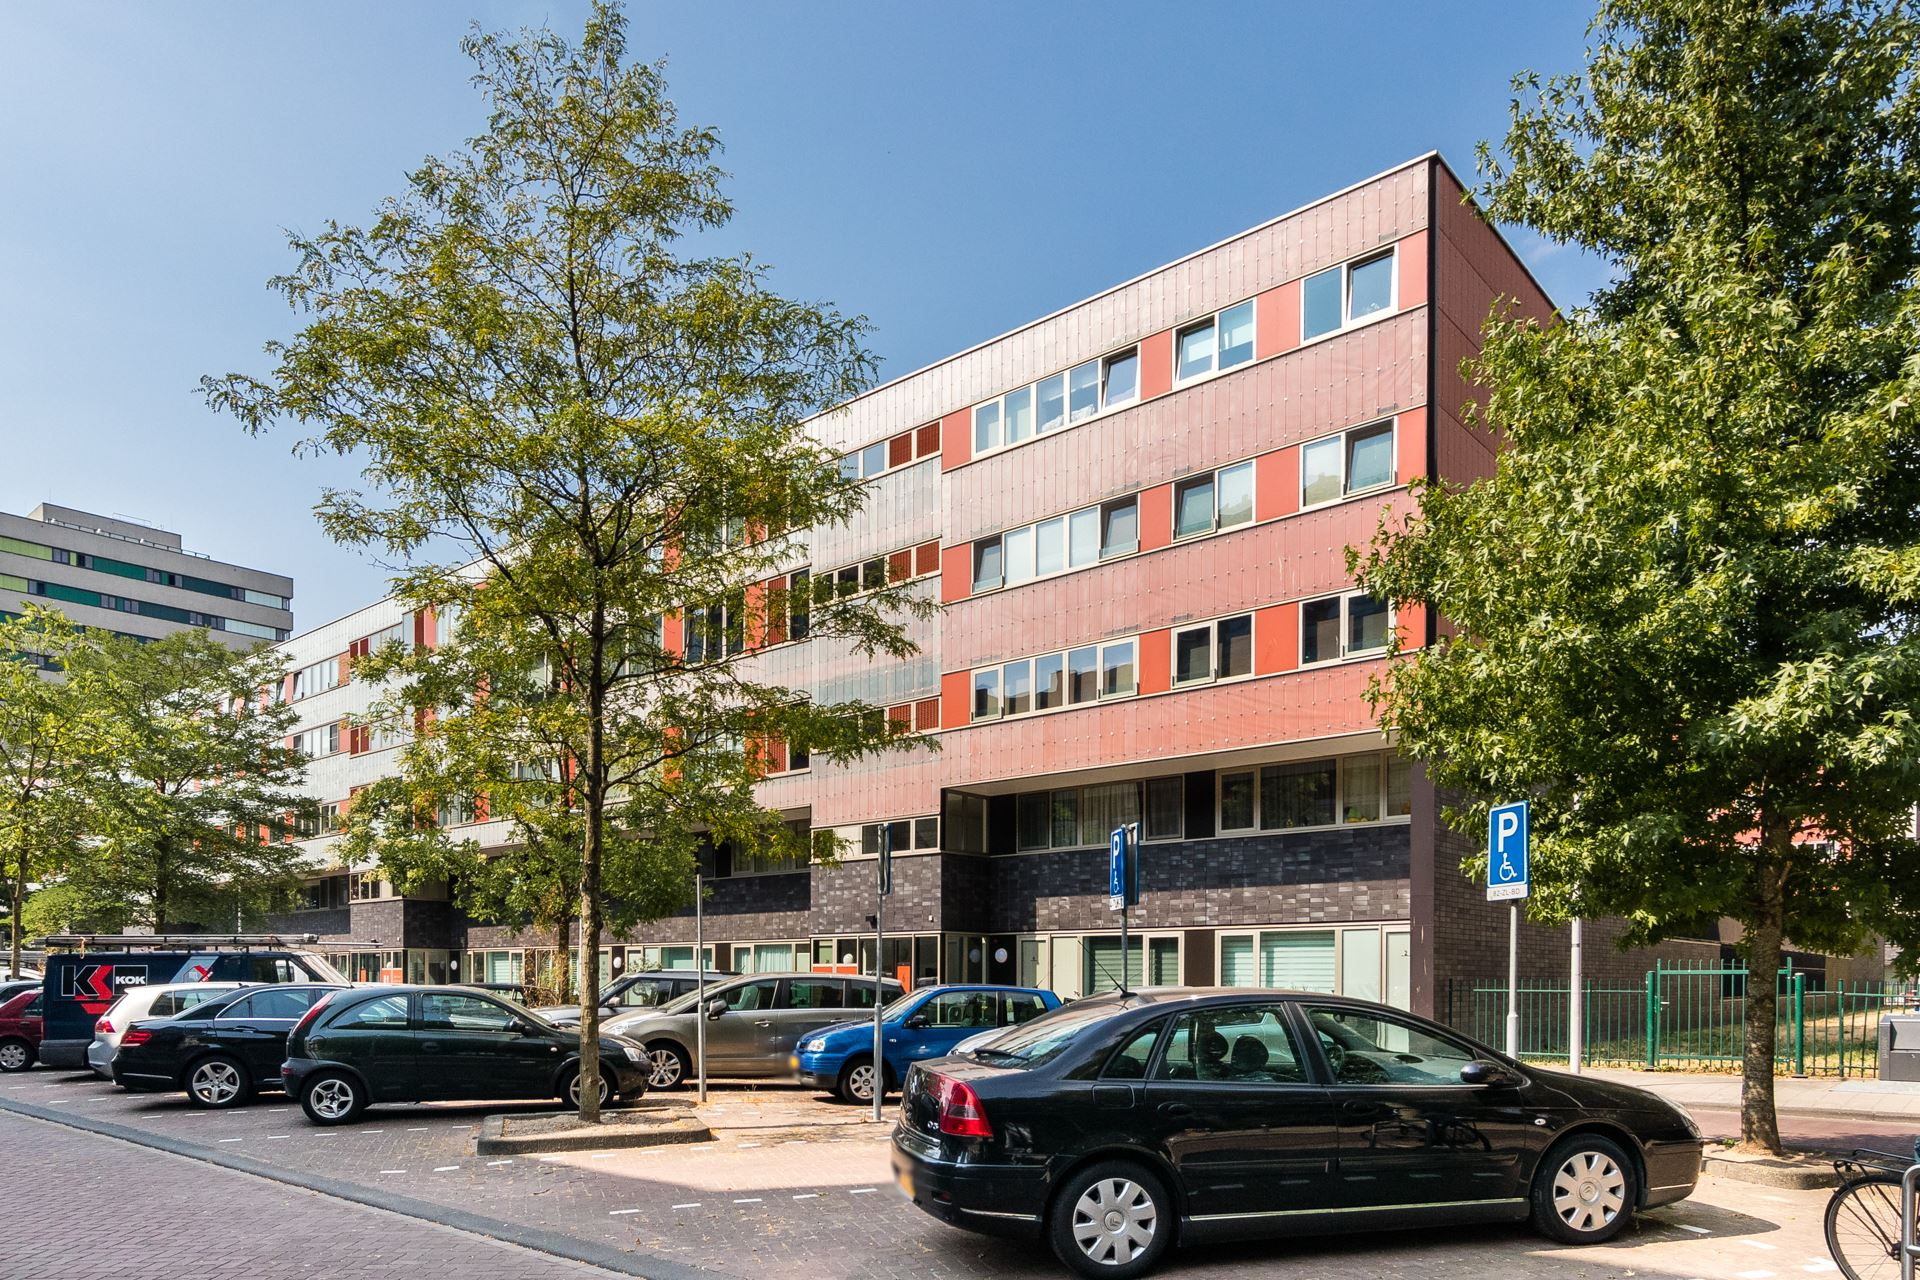 Kwintsheulstraat